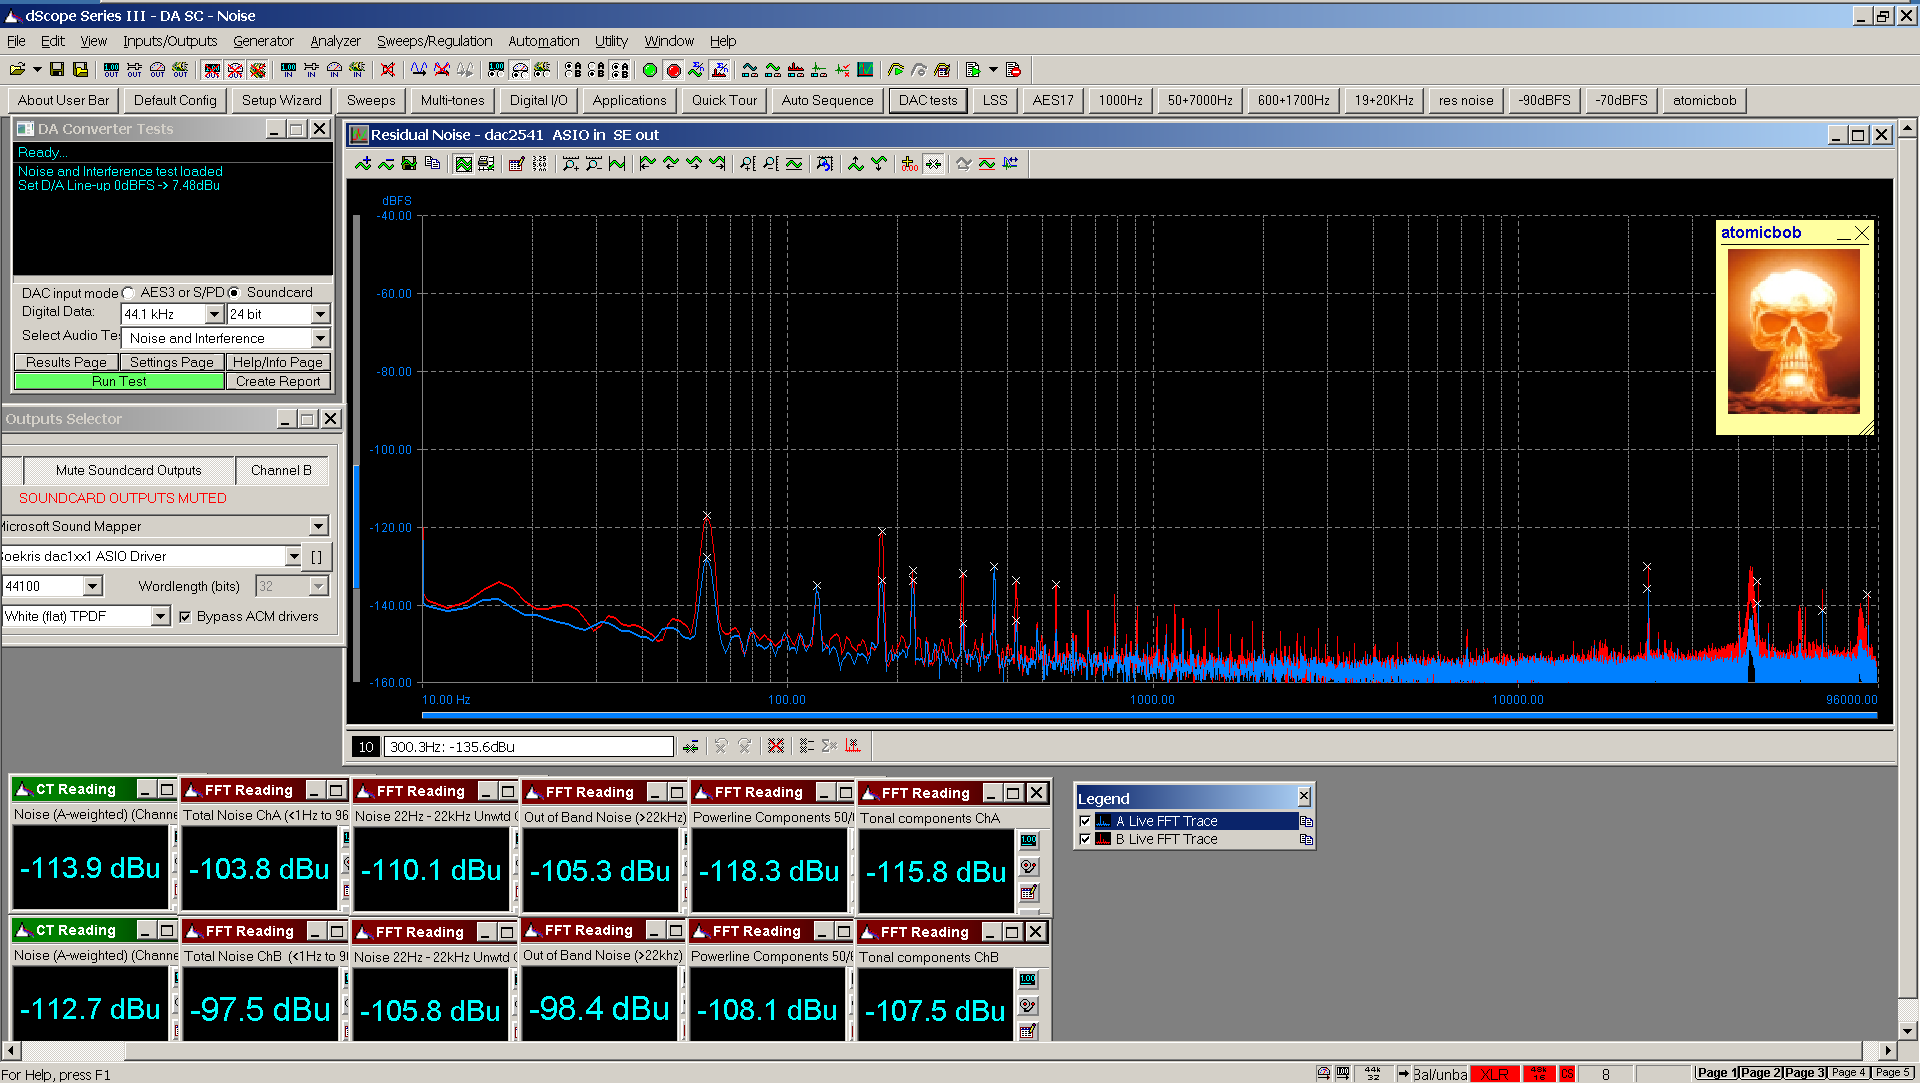 06 20210125 dac2541 residual noise FFT USB SE - 160 dB range.png